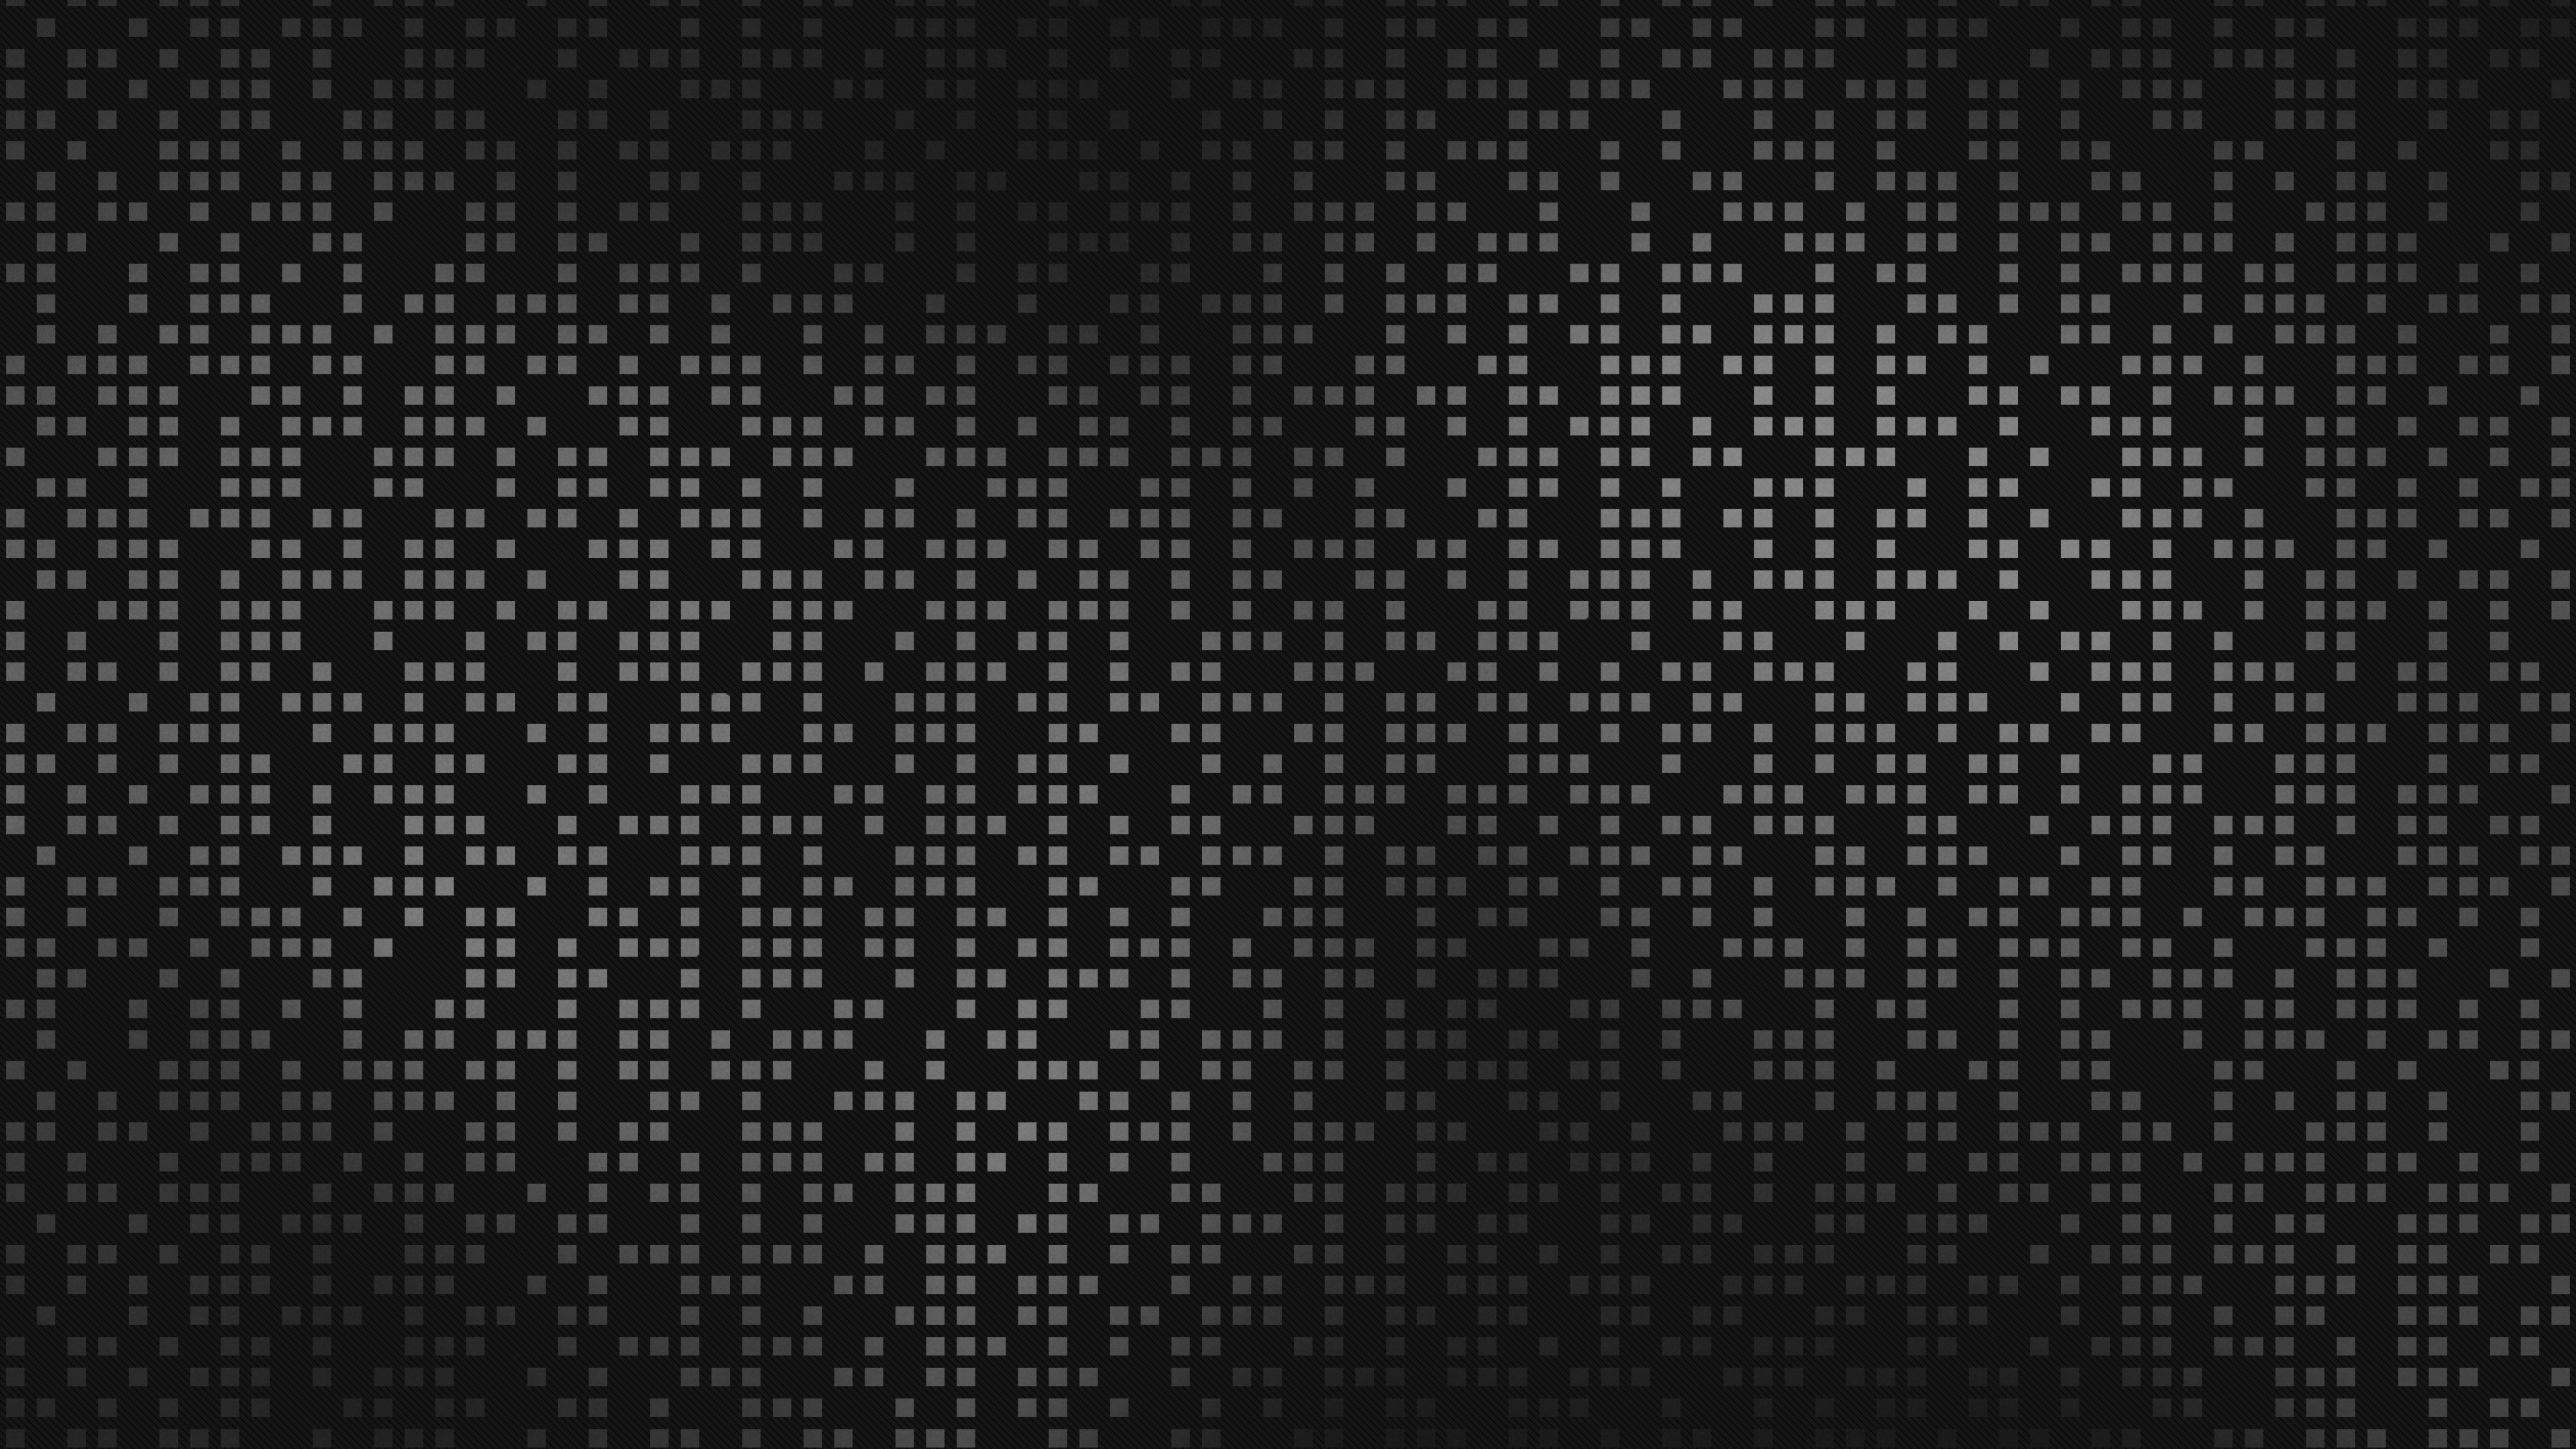 Grey Wallpaper Hd: Red And Black 4K Wallpaper